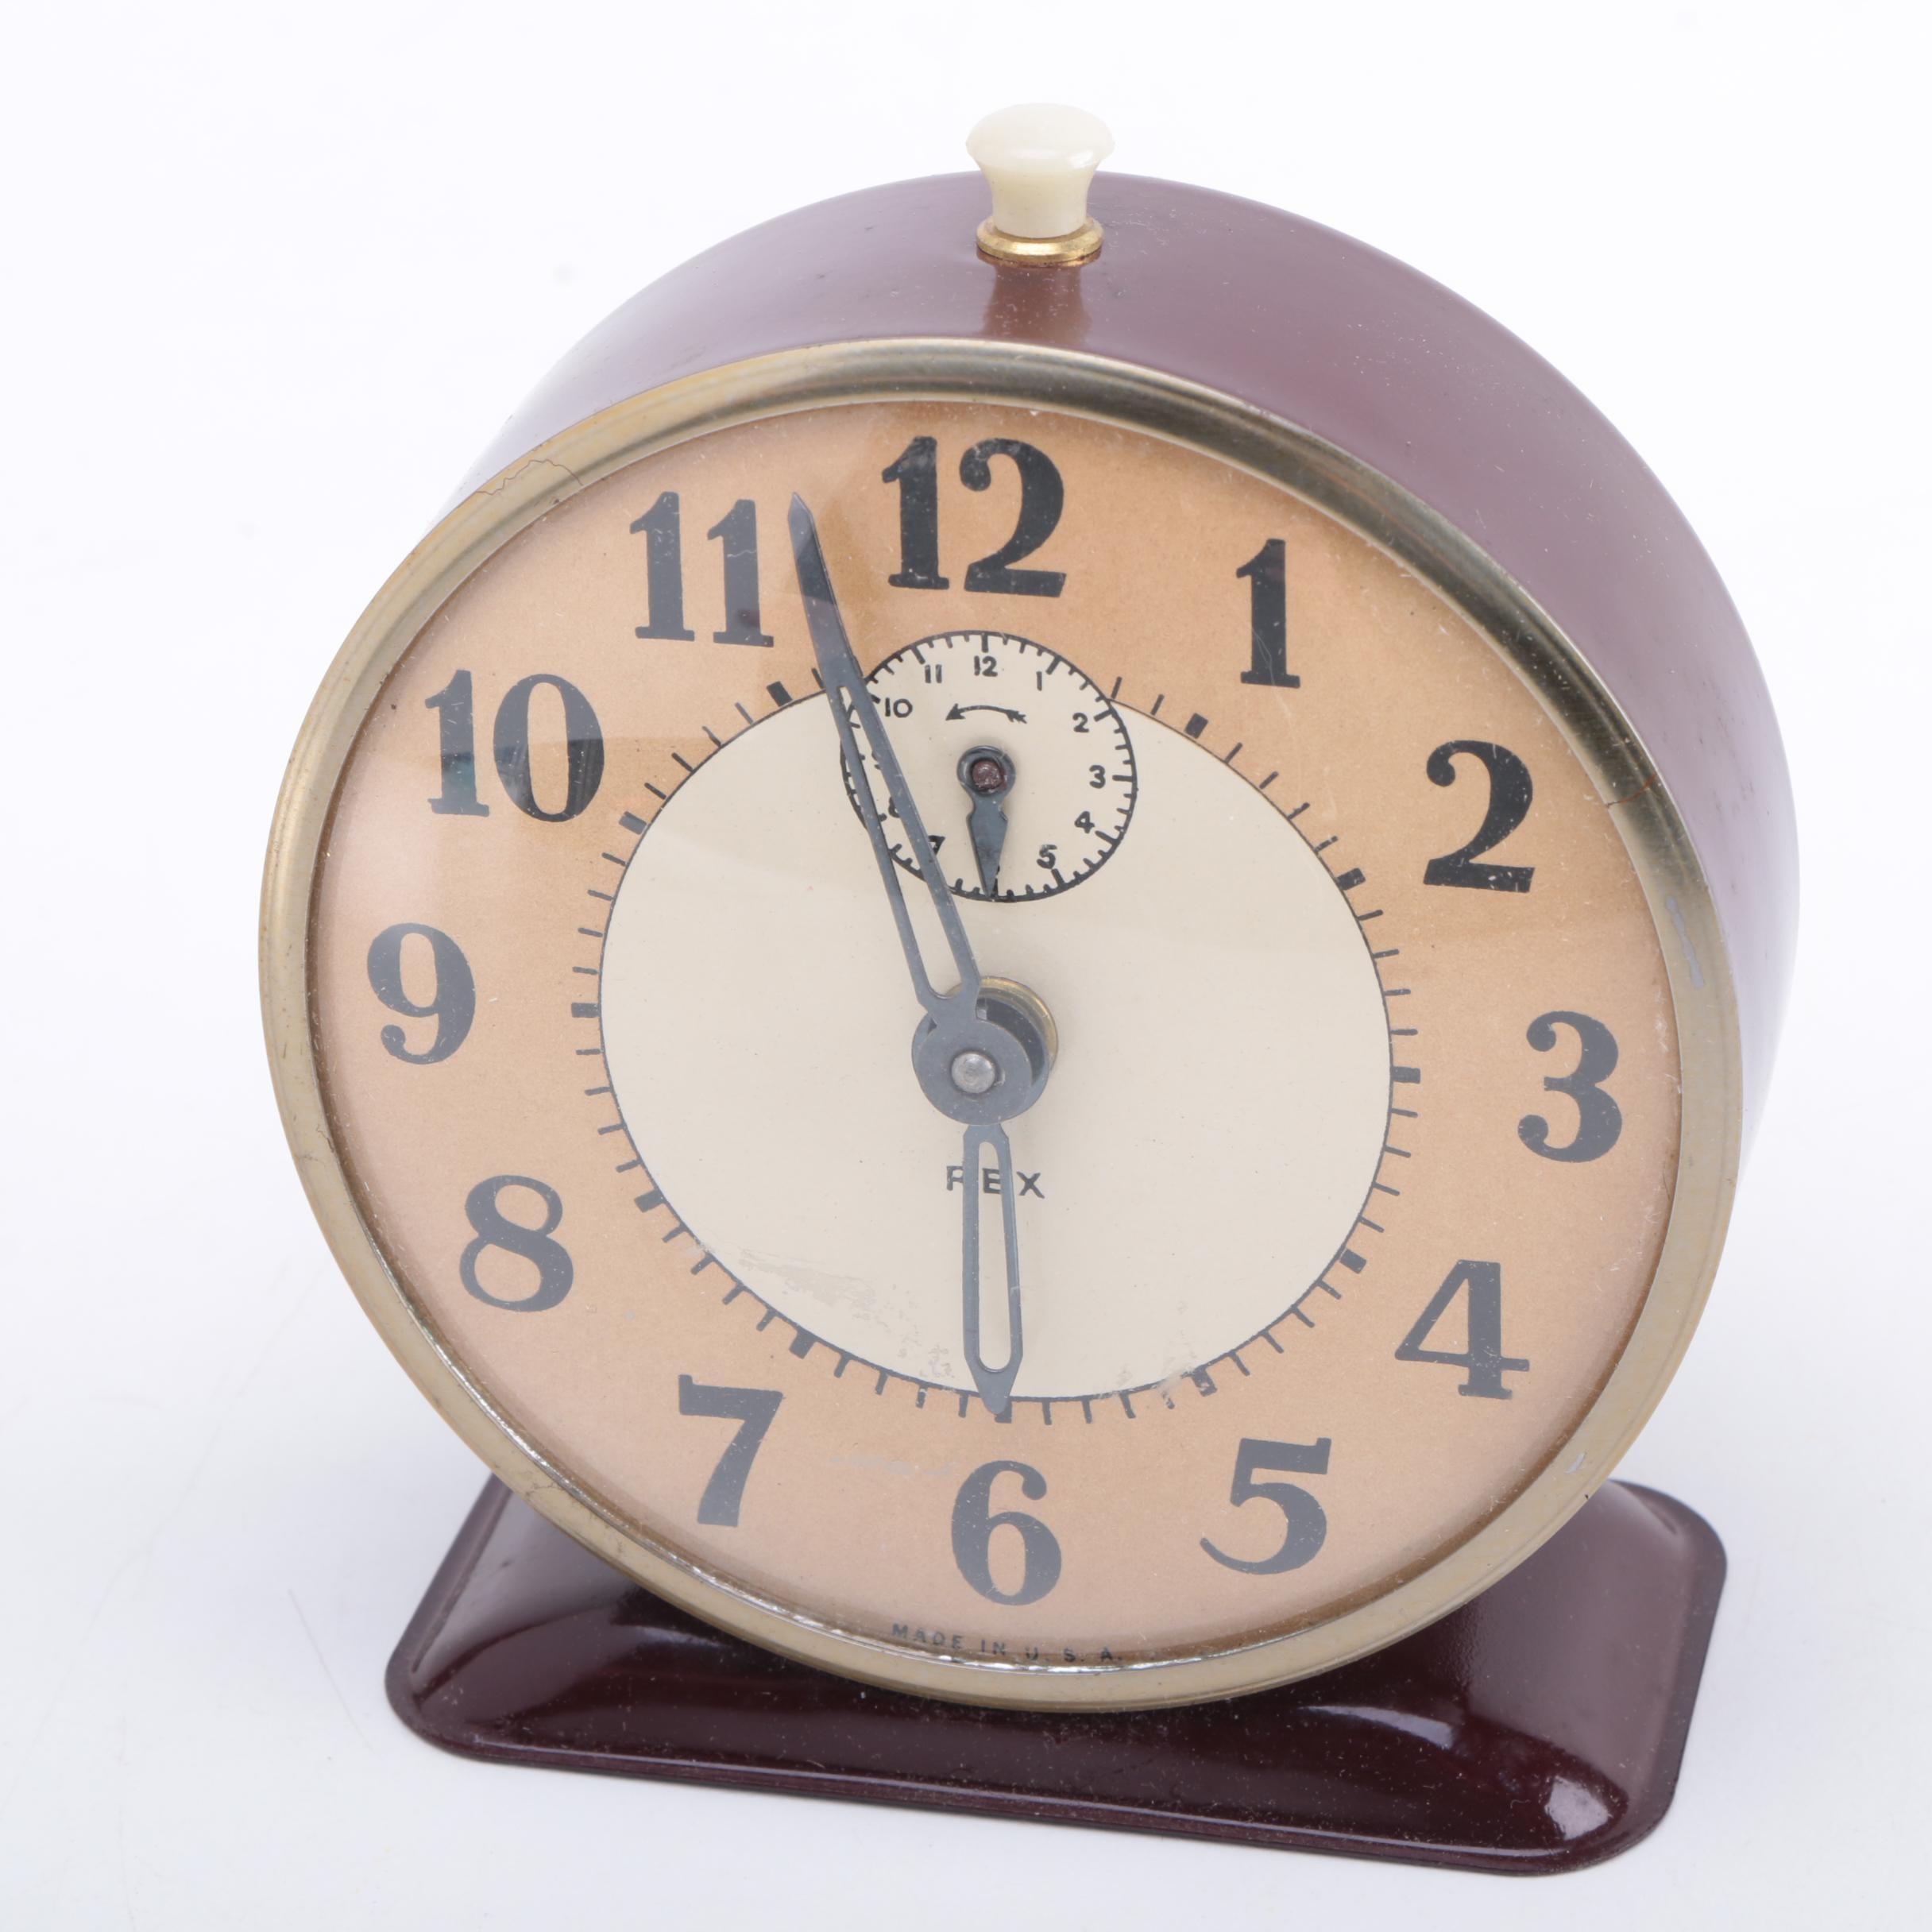 Vintage Rexall Alarm Clock